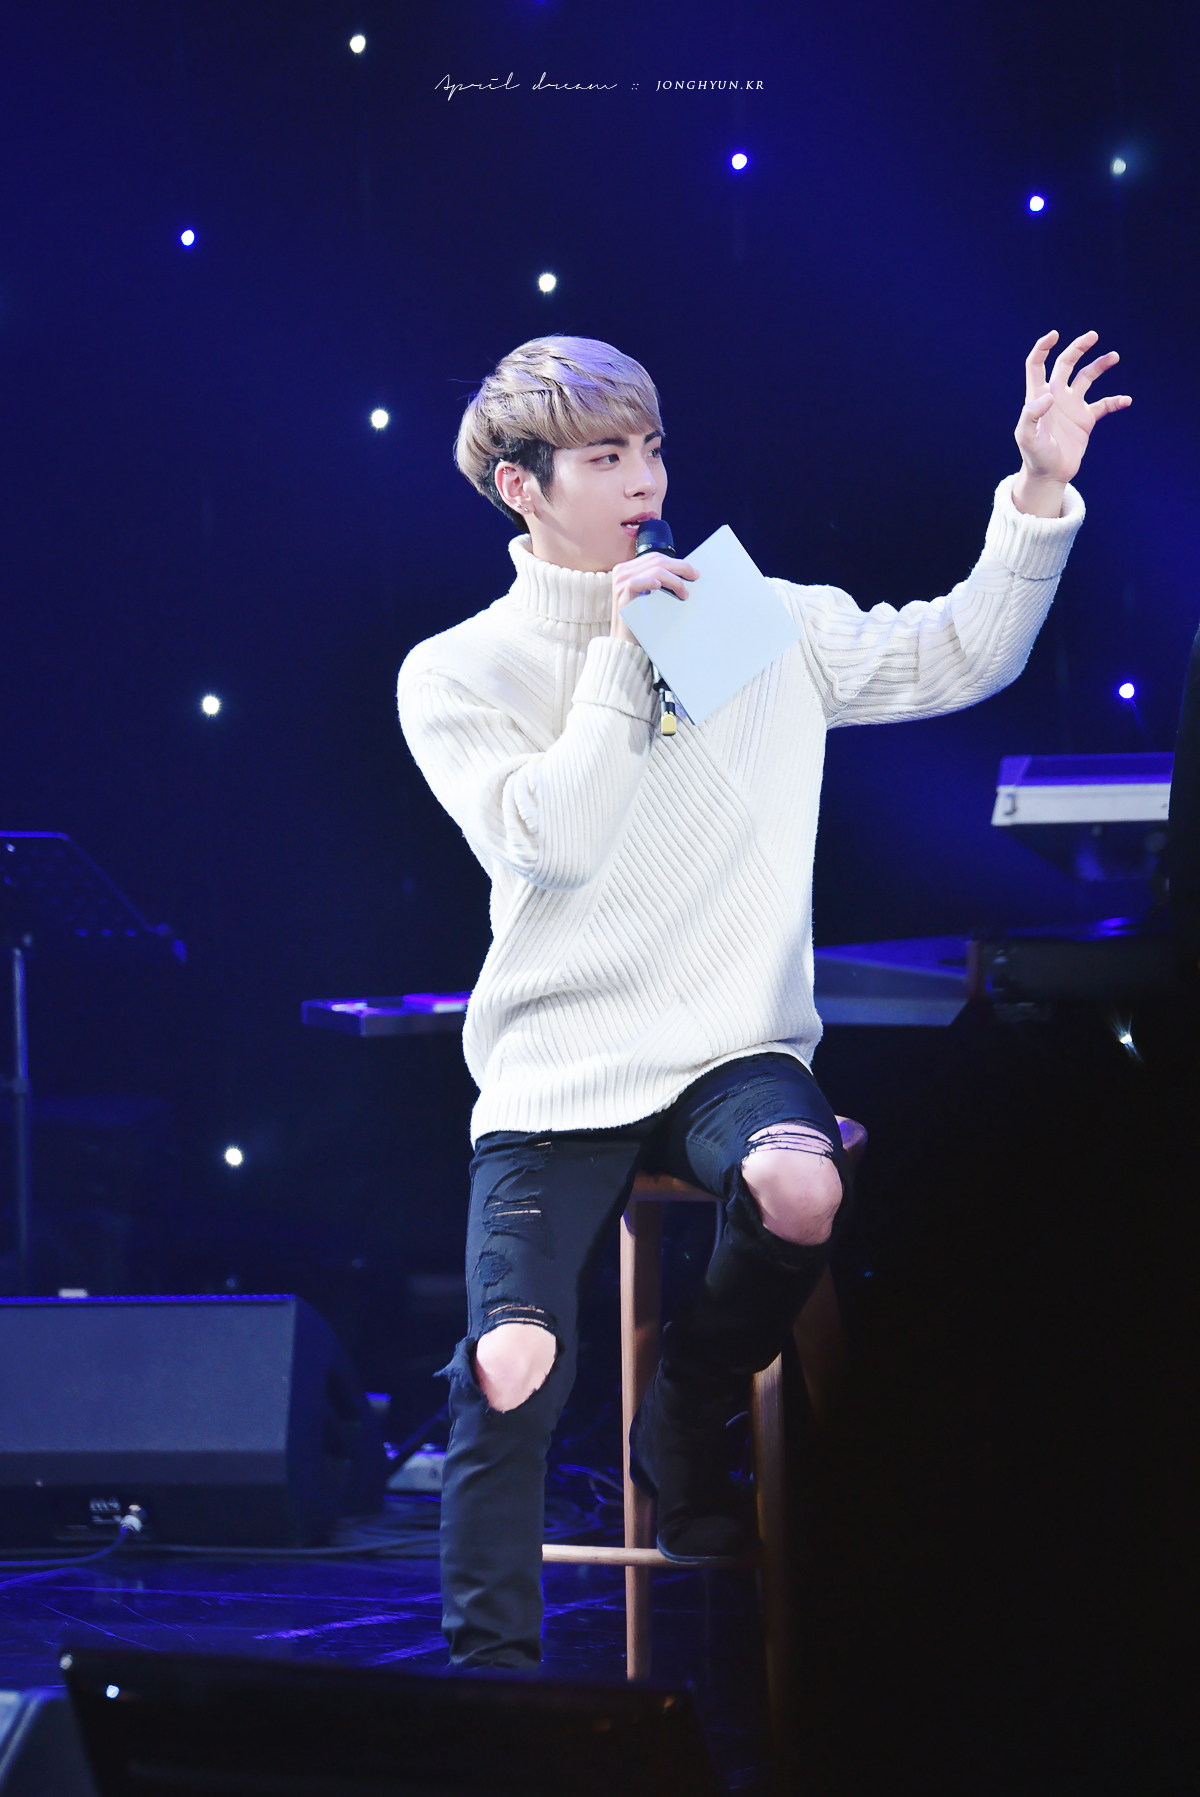 151208 Jonghyun @ MBC Harmony Live Concert 23314409760_d4804bfa12_o